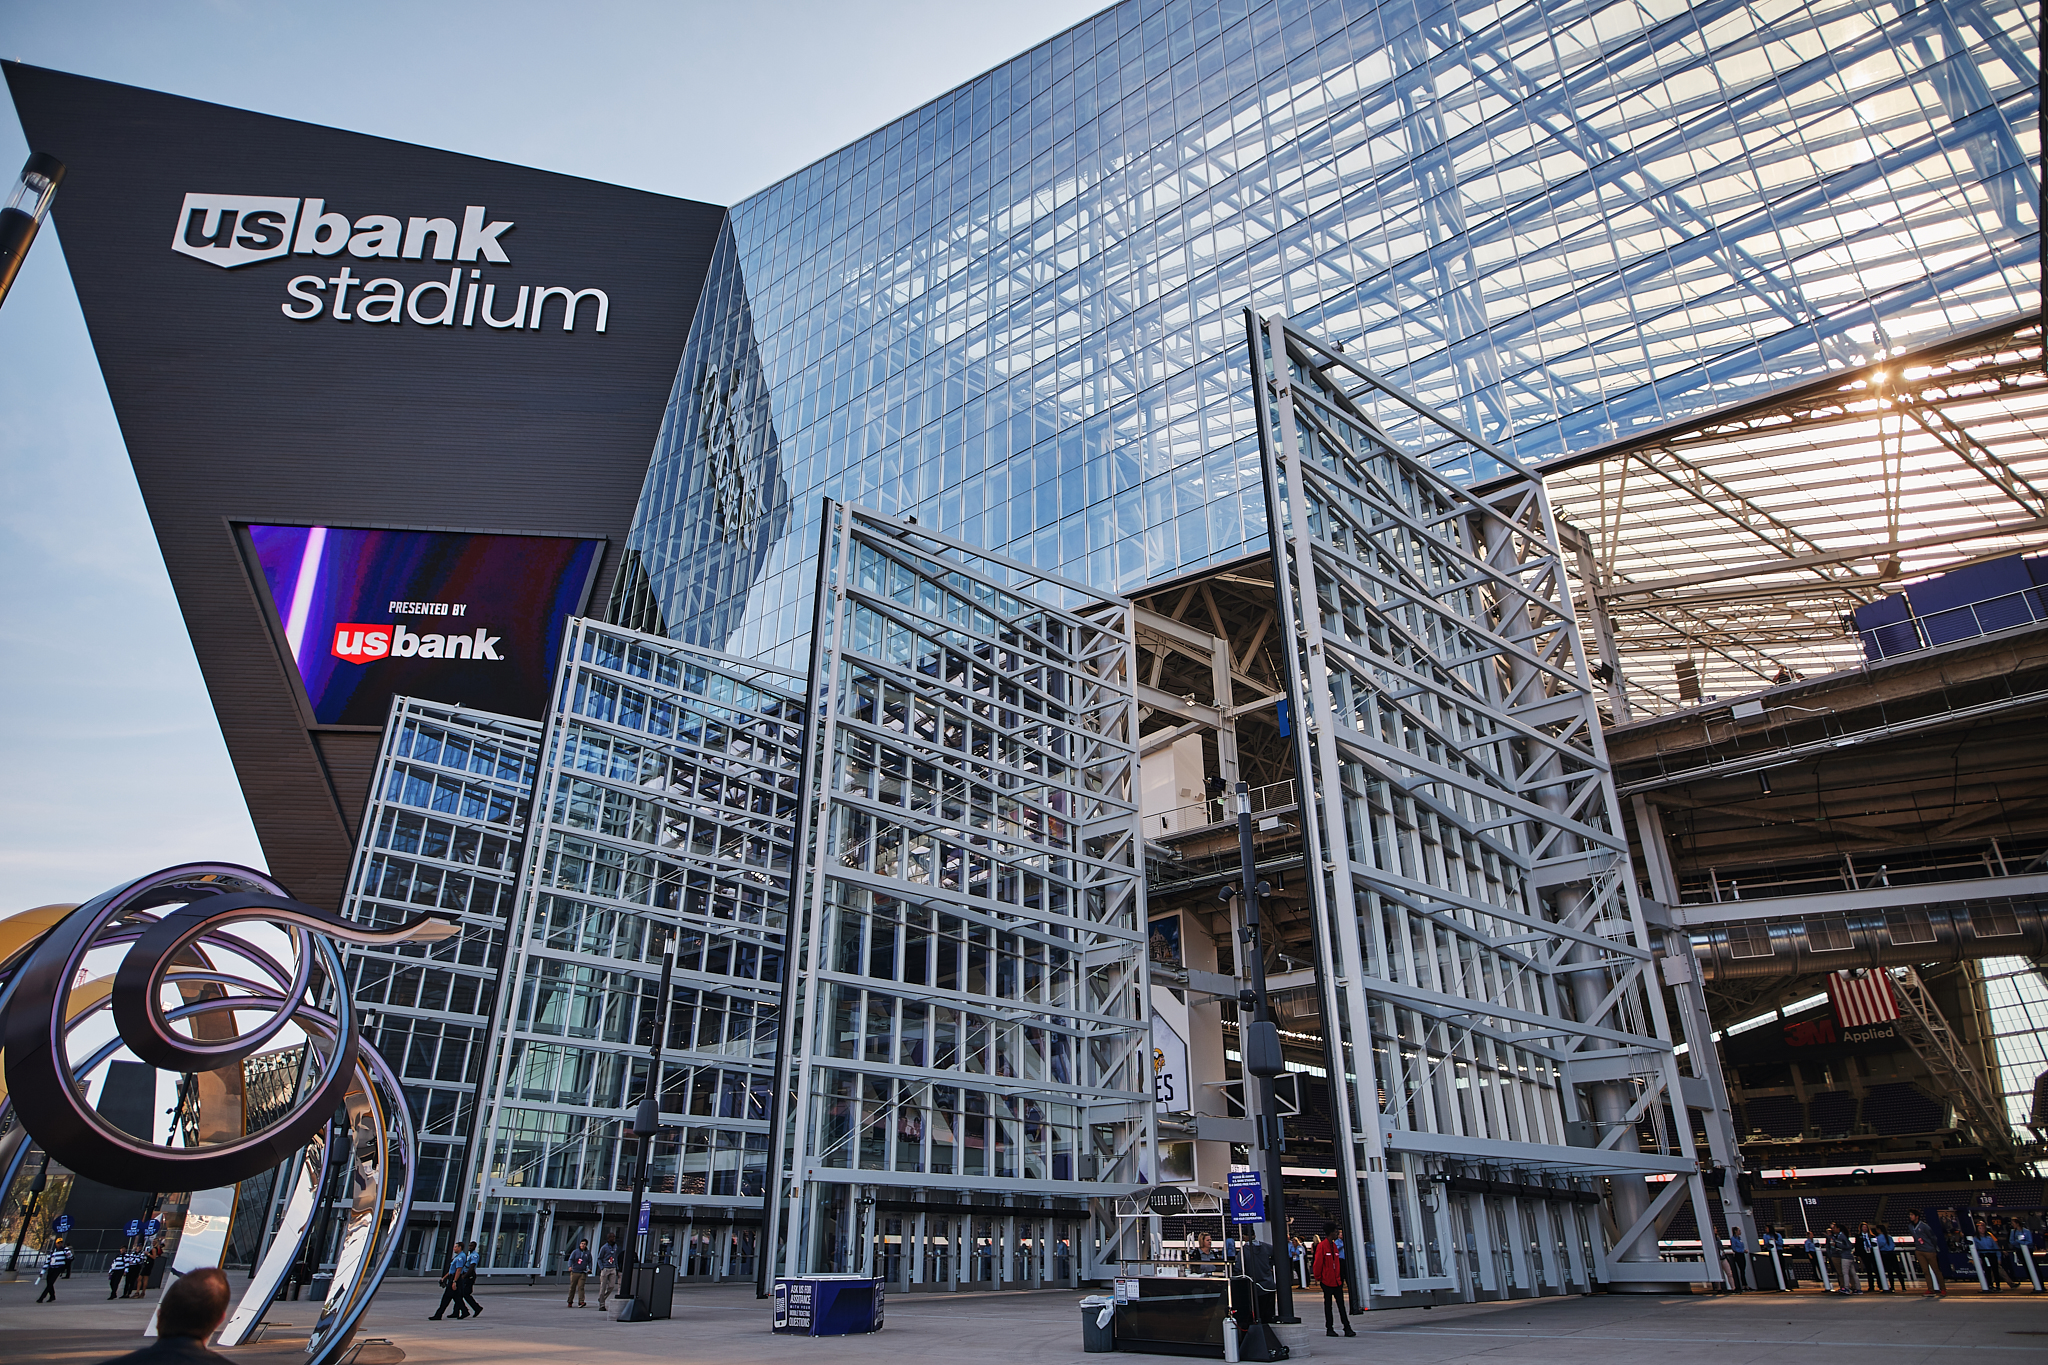 Minnesota_Vikings_Game_US_Bank_Stadium_Minneapolis_Minnesota_Photography_By_Joe_Lemke_051.JPG